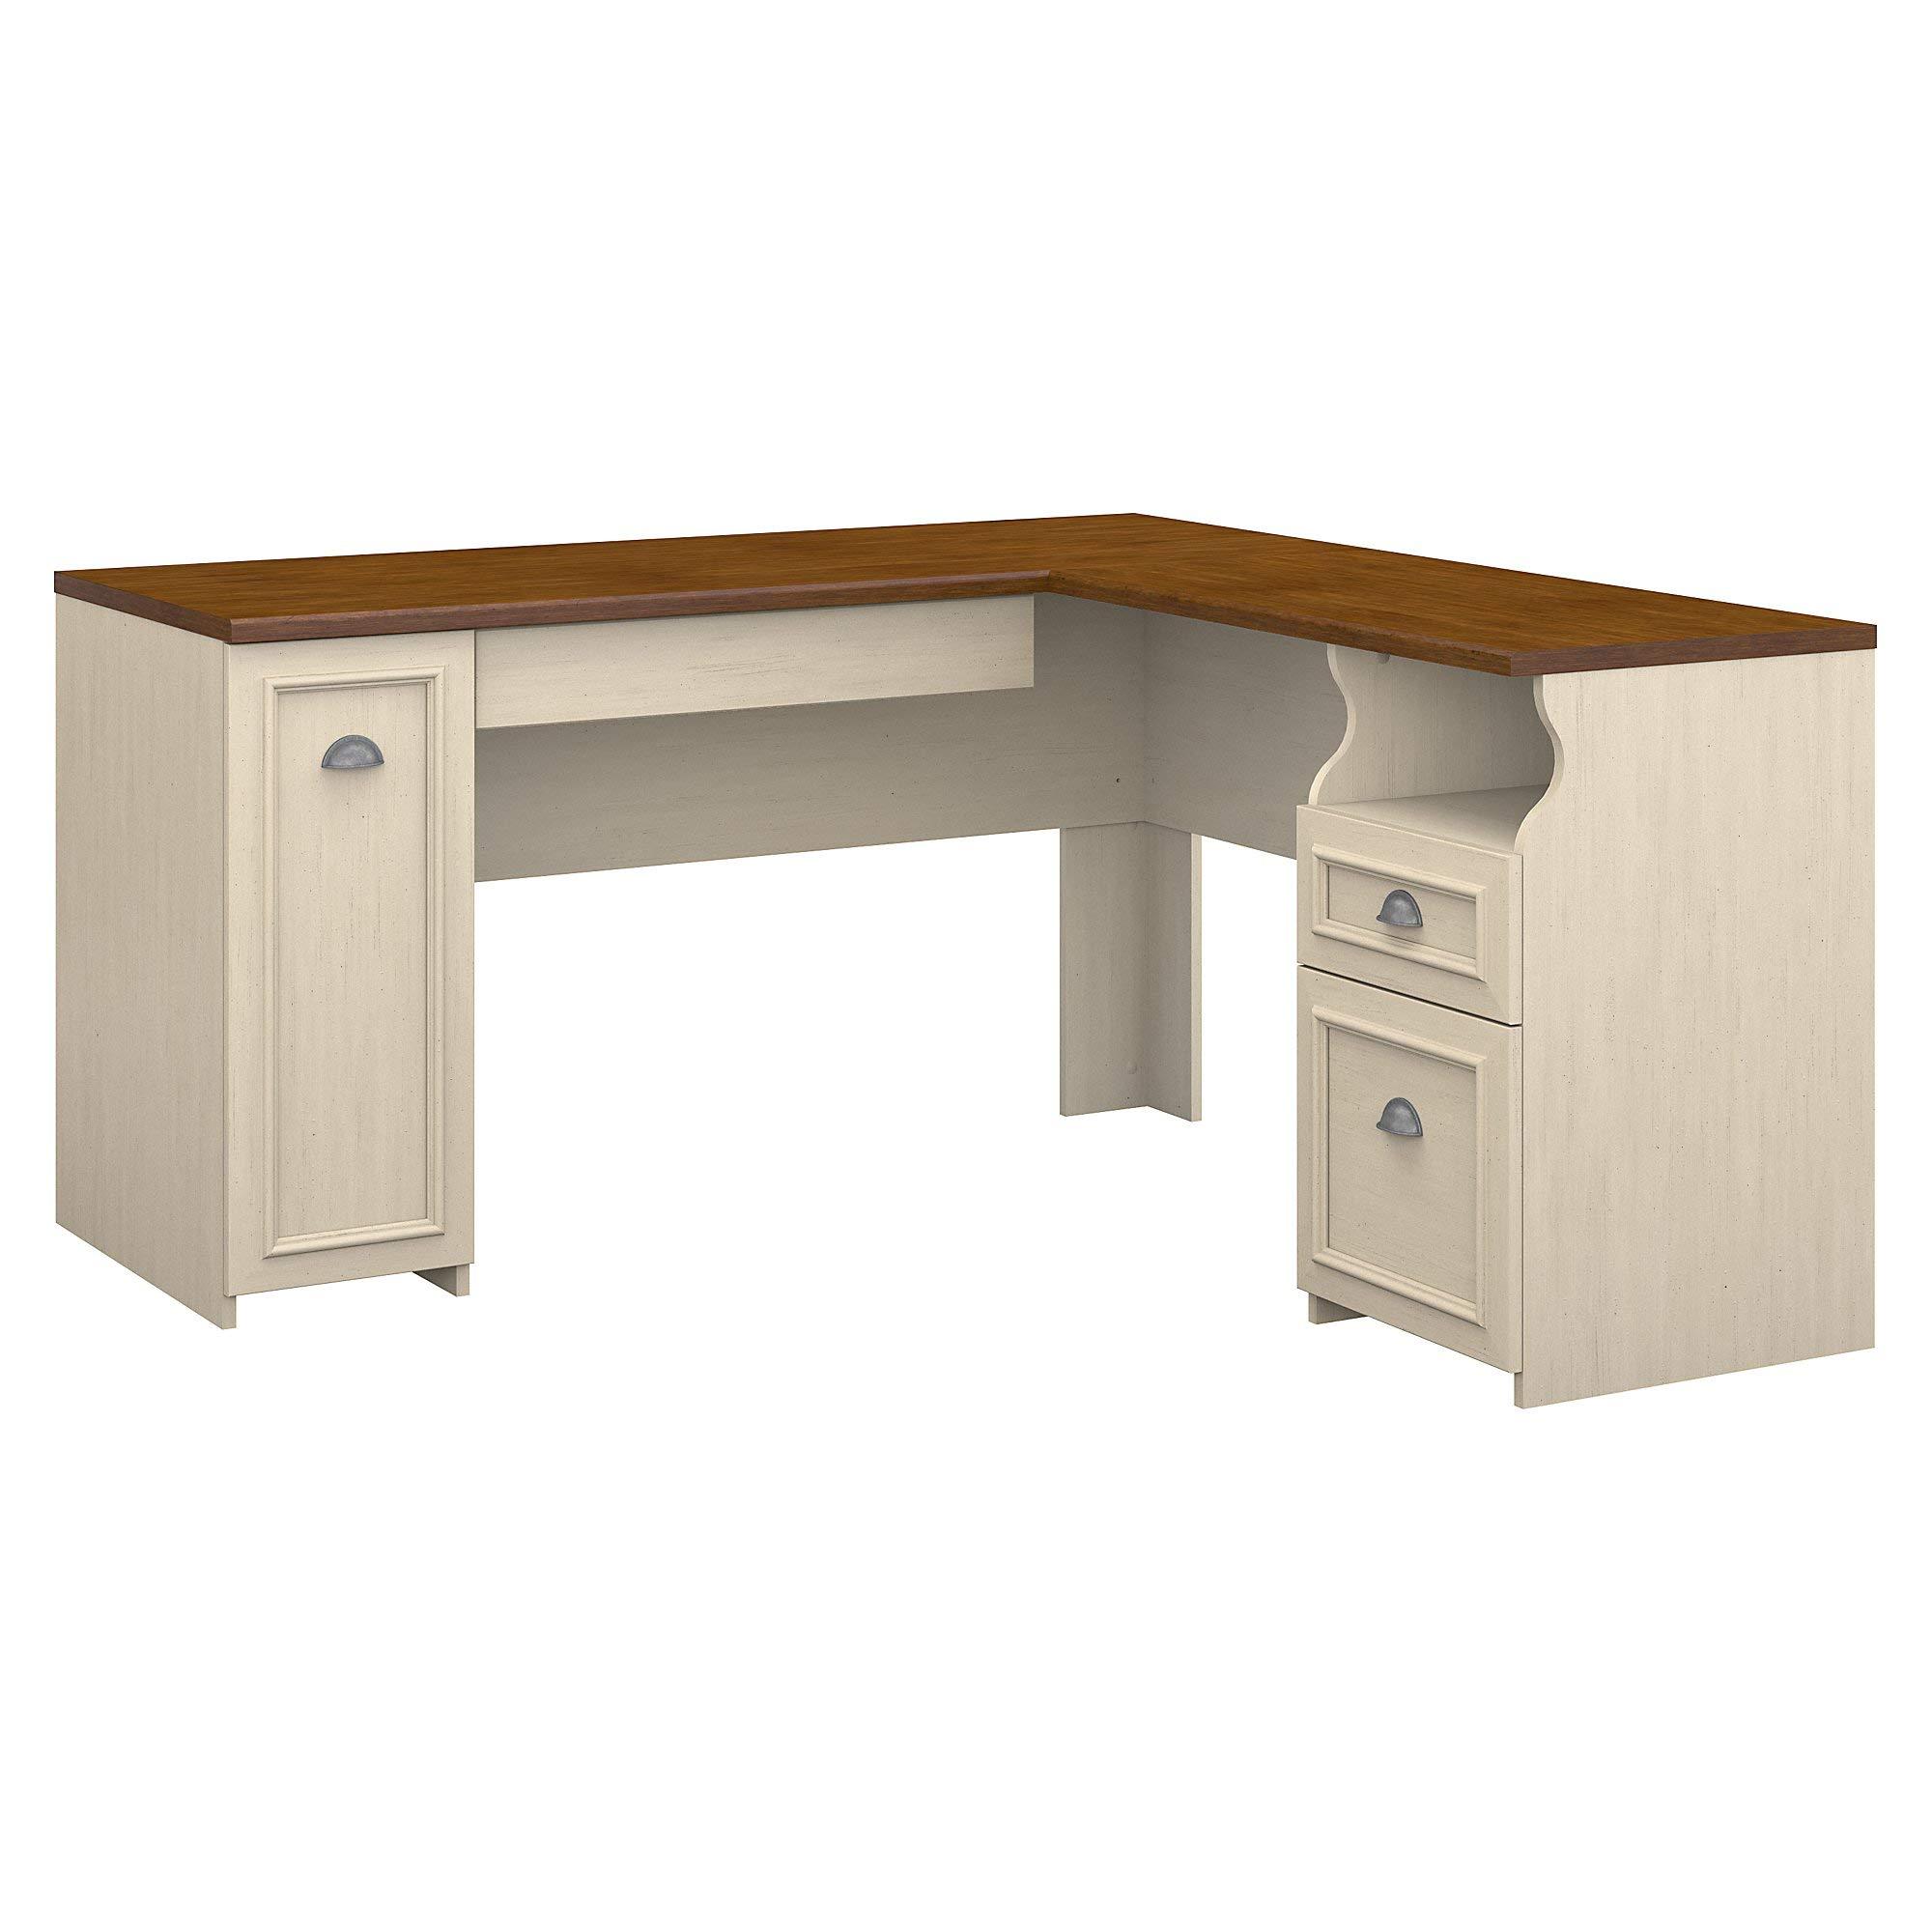 Bush Furniture Fairview L Shaped Desk in Antique White by Bush Furniture